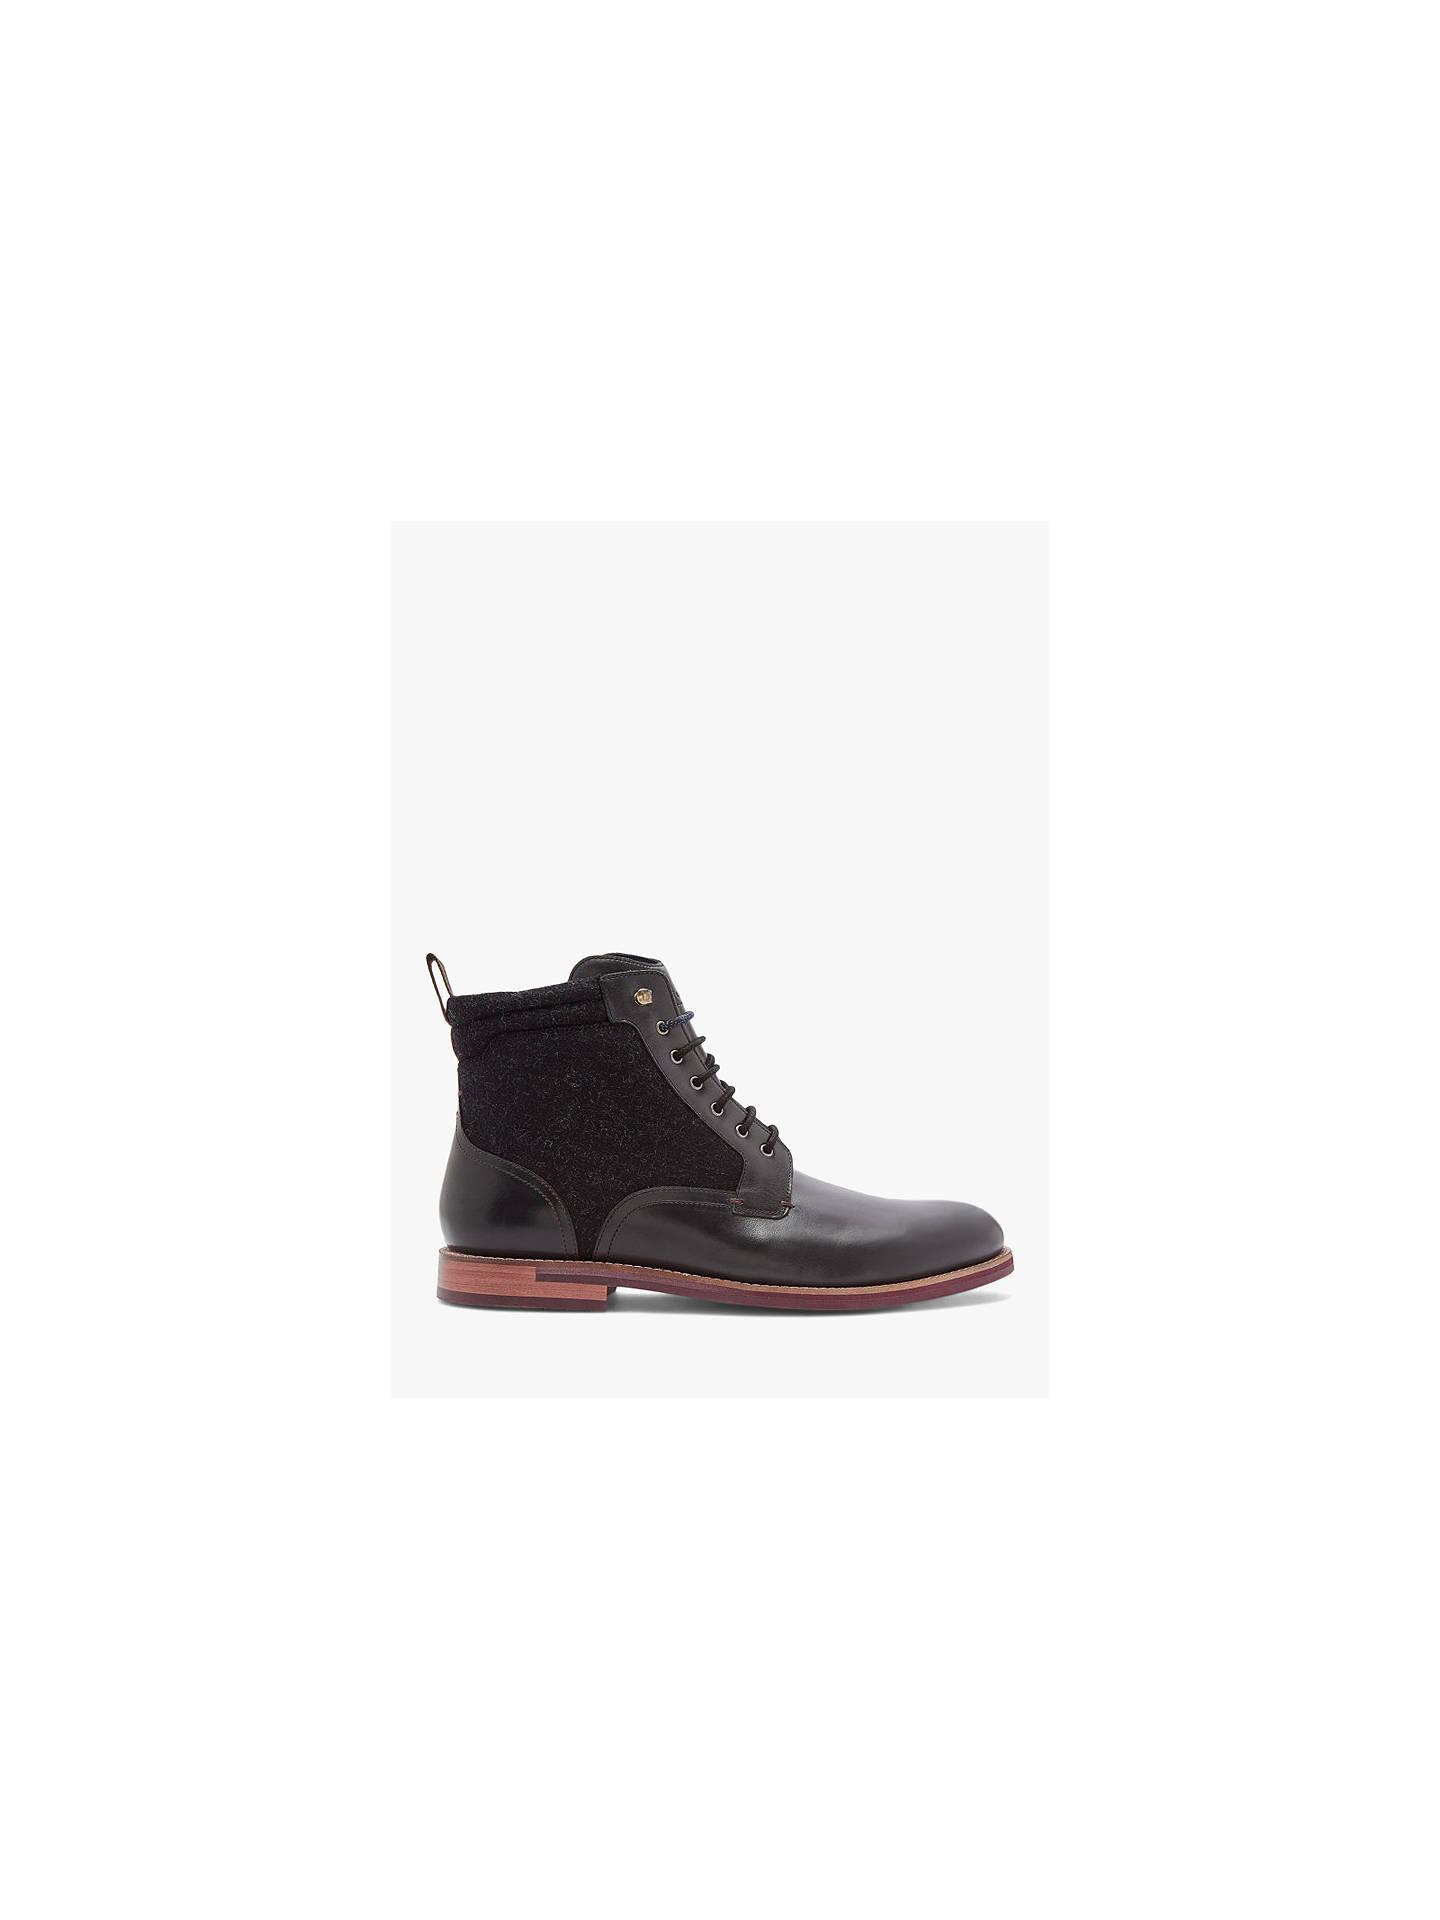 9ba50e841 Buy Ted Baker Axtoni Boots